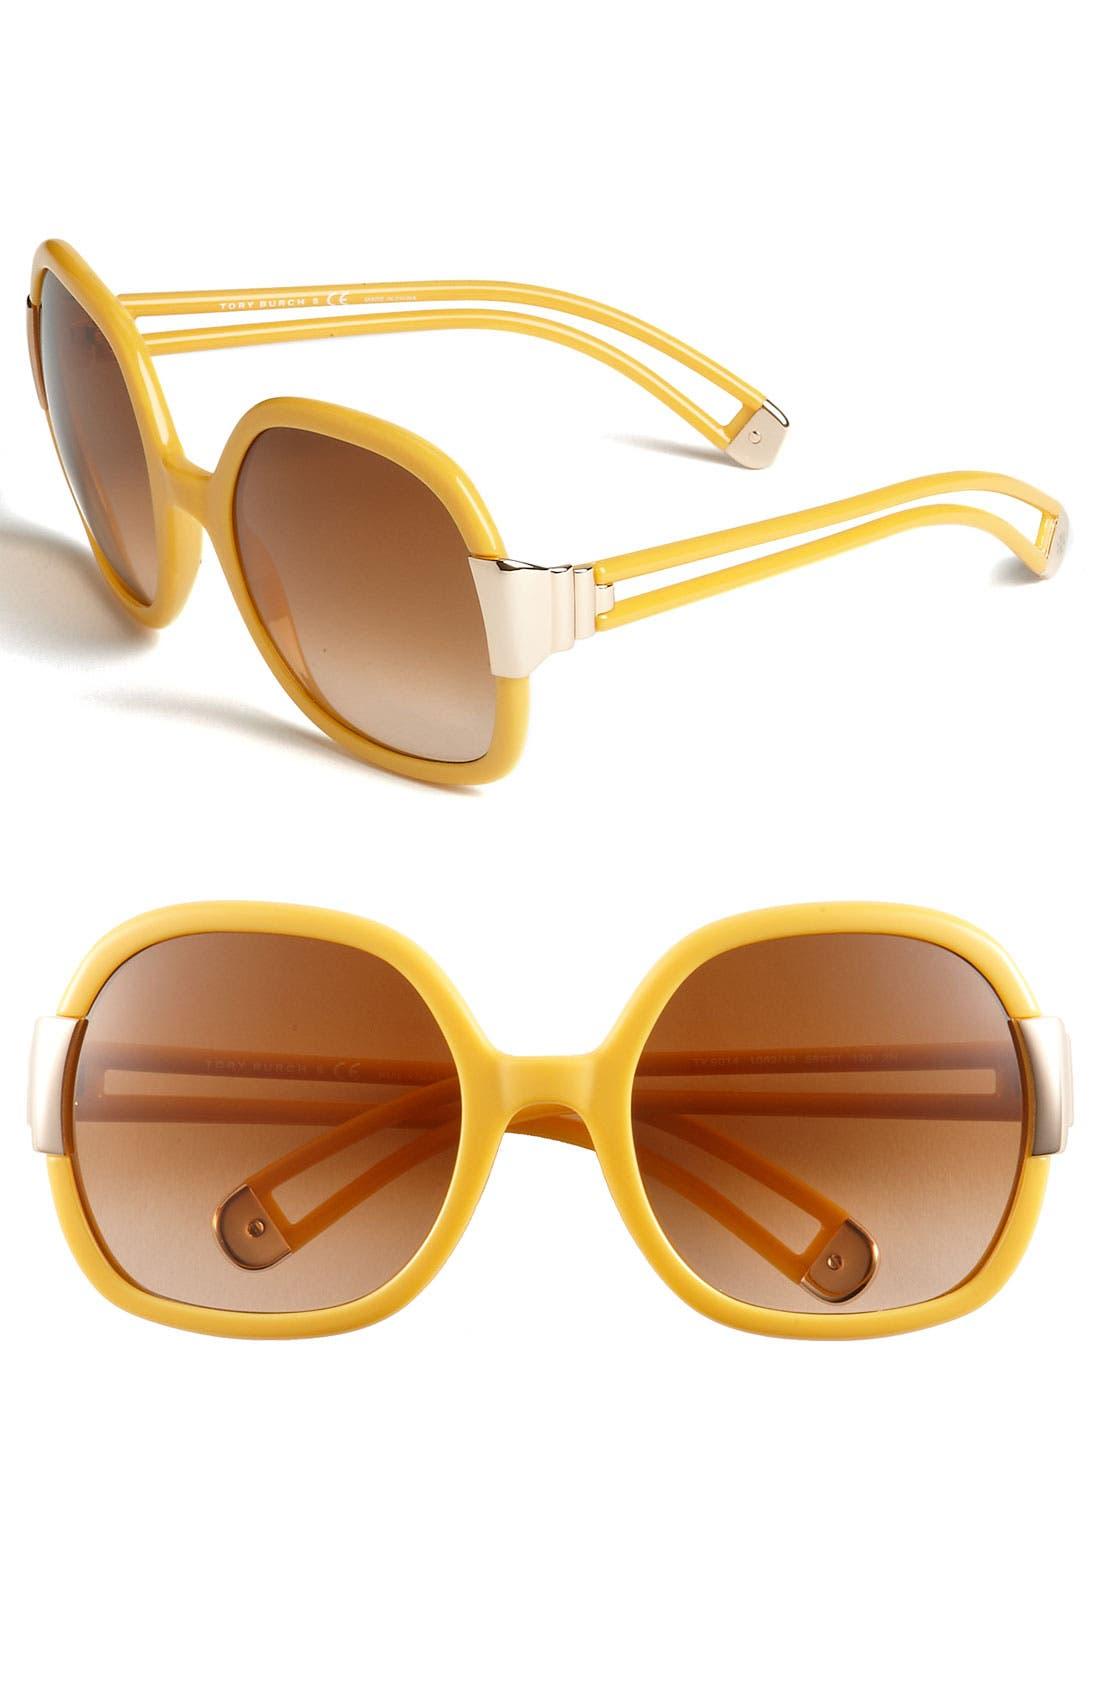 Main Image - Tory Burch 56mm Oversized Sunglasses